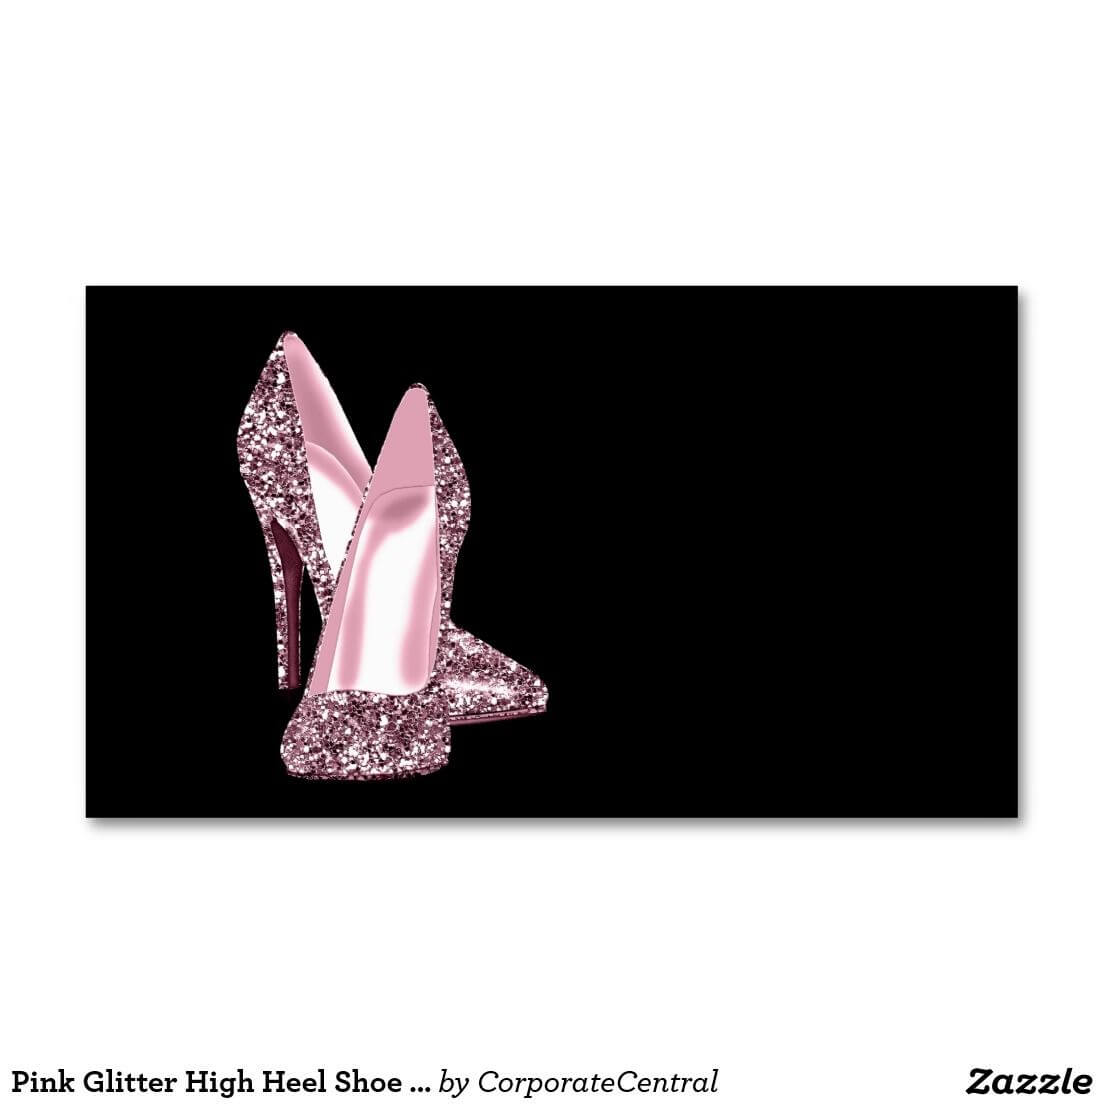 Pink Glitter High Heel Shoe Business Card Template   Zazzle inside High Heel Template For Cards